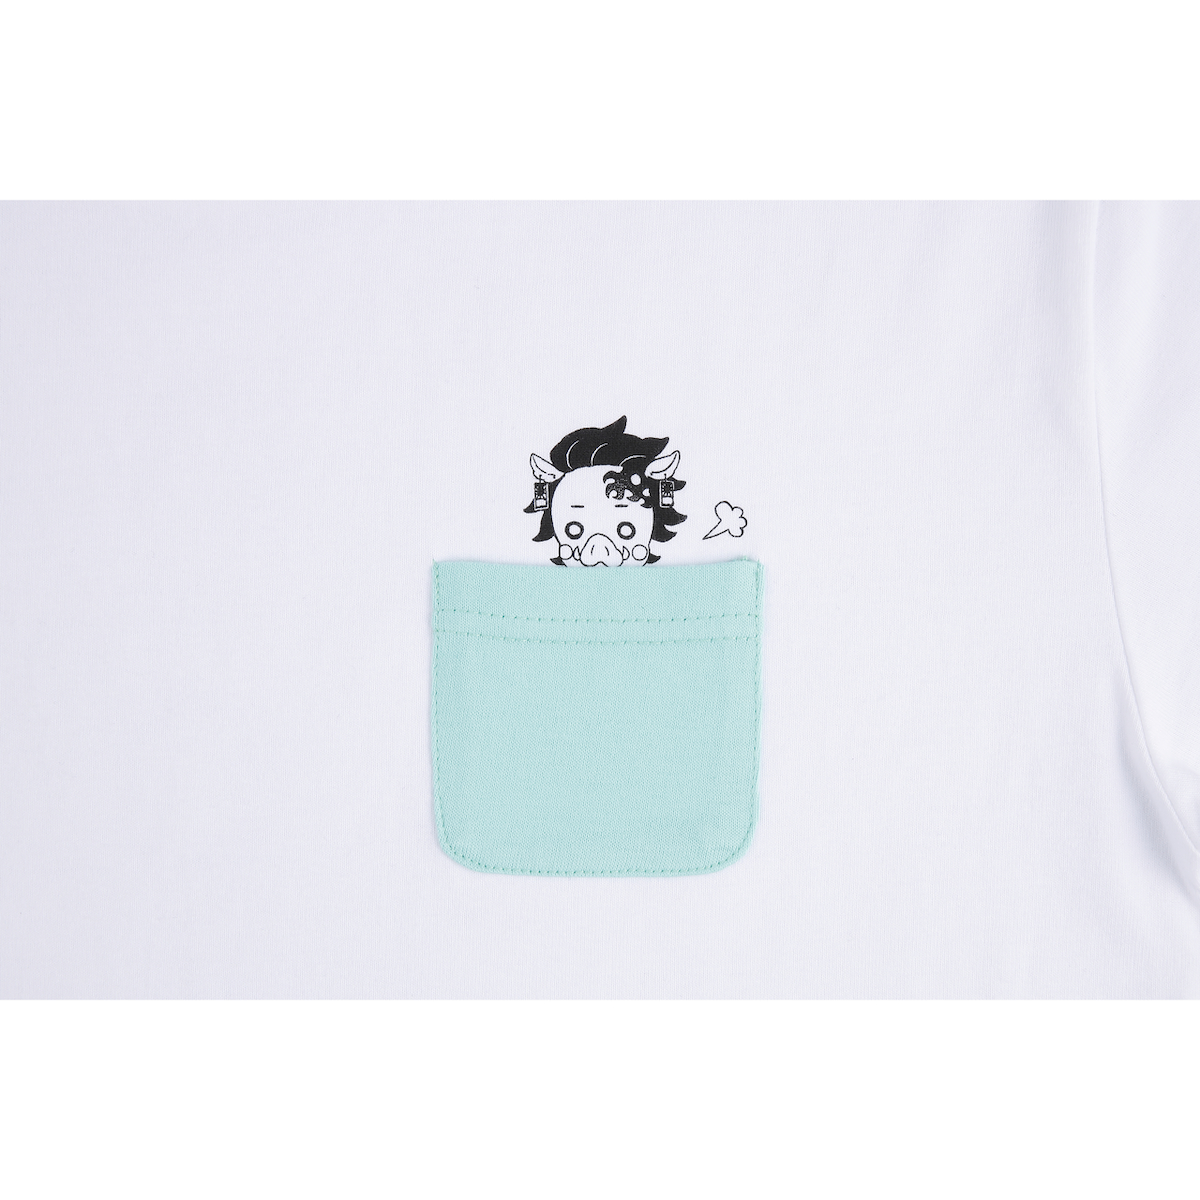 Tシャツ ウリ坊シリーズ アップ ©吾峠呼世晴/集英社